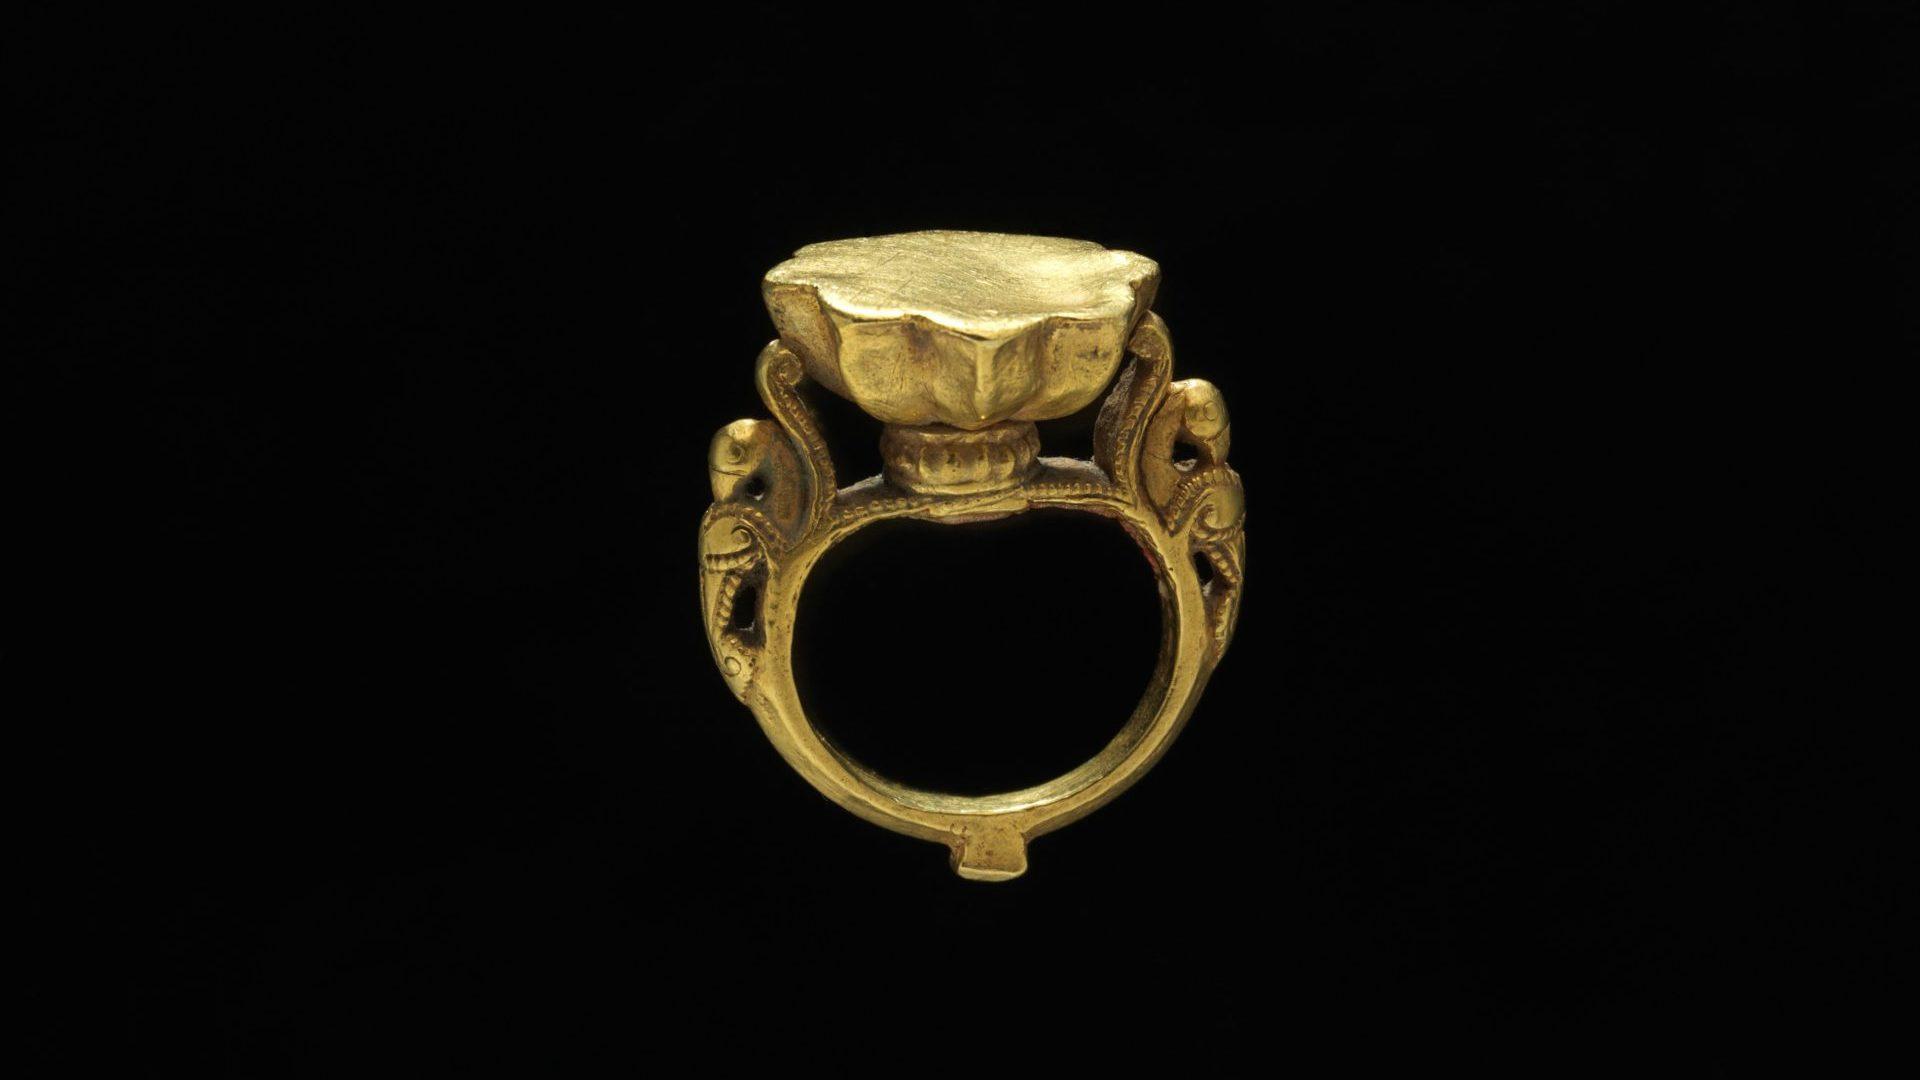 Ring, 17th century Islamic, Deccan Sultanate period